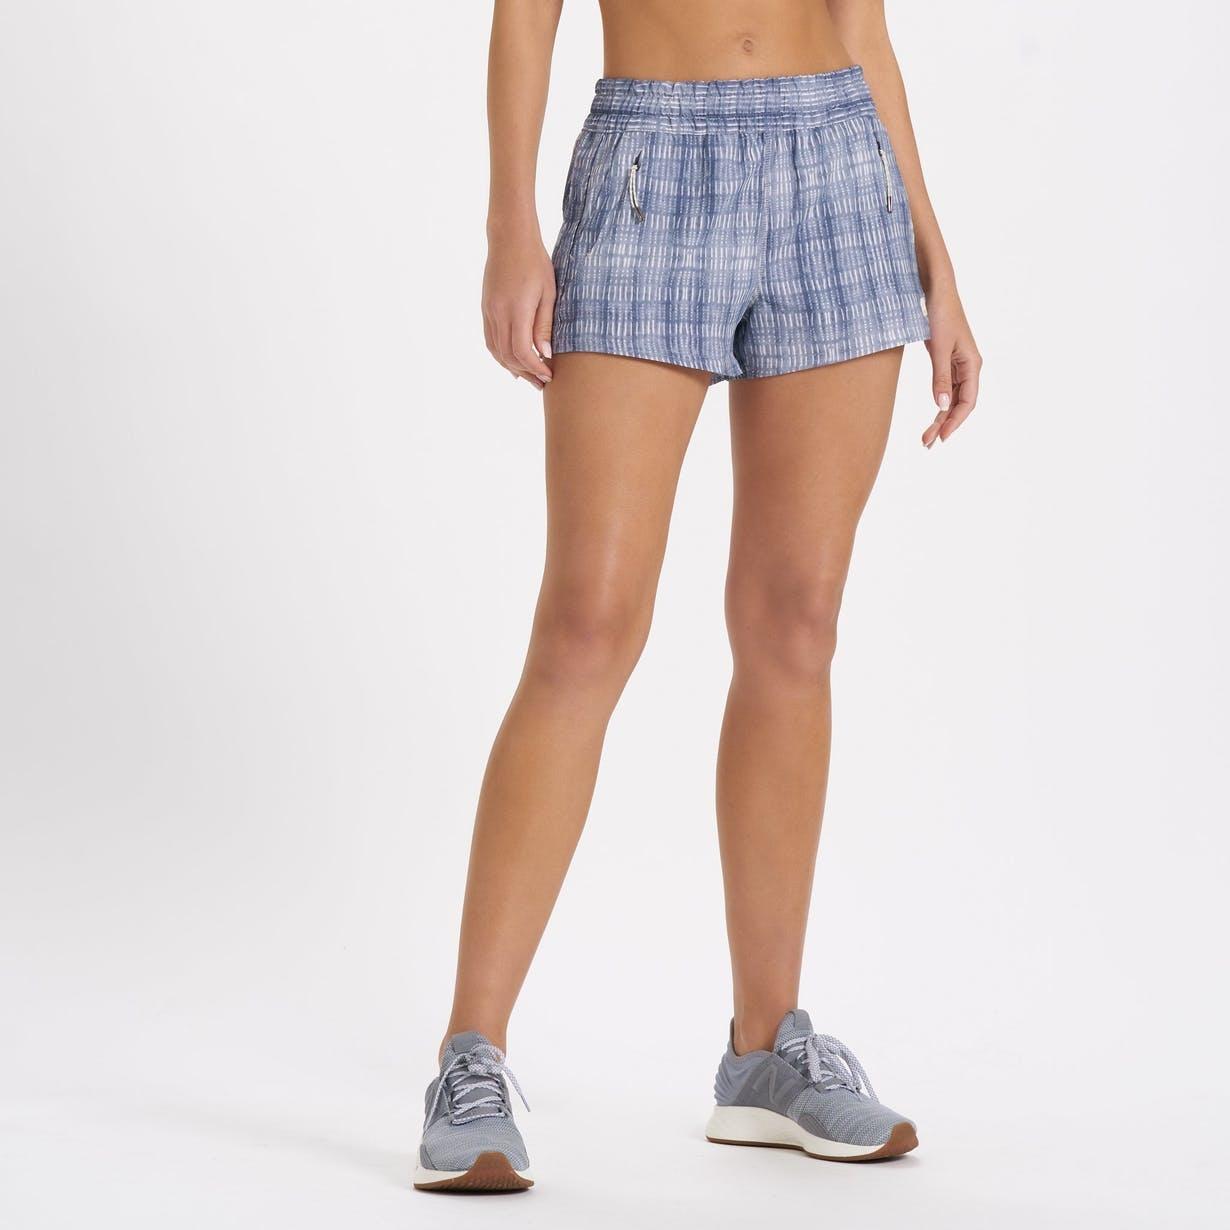 Vuori Women's Dash Short